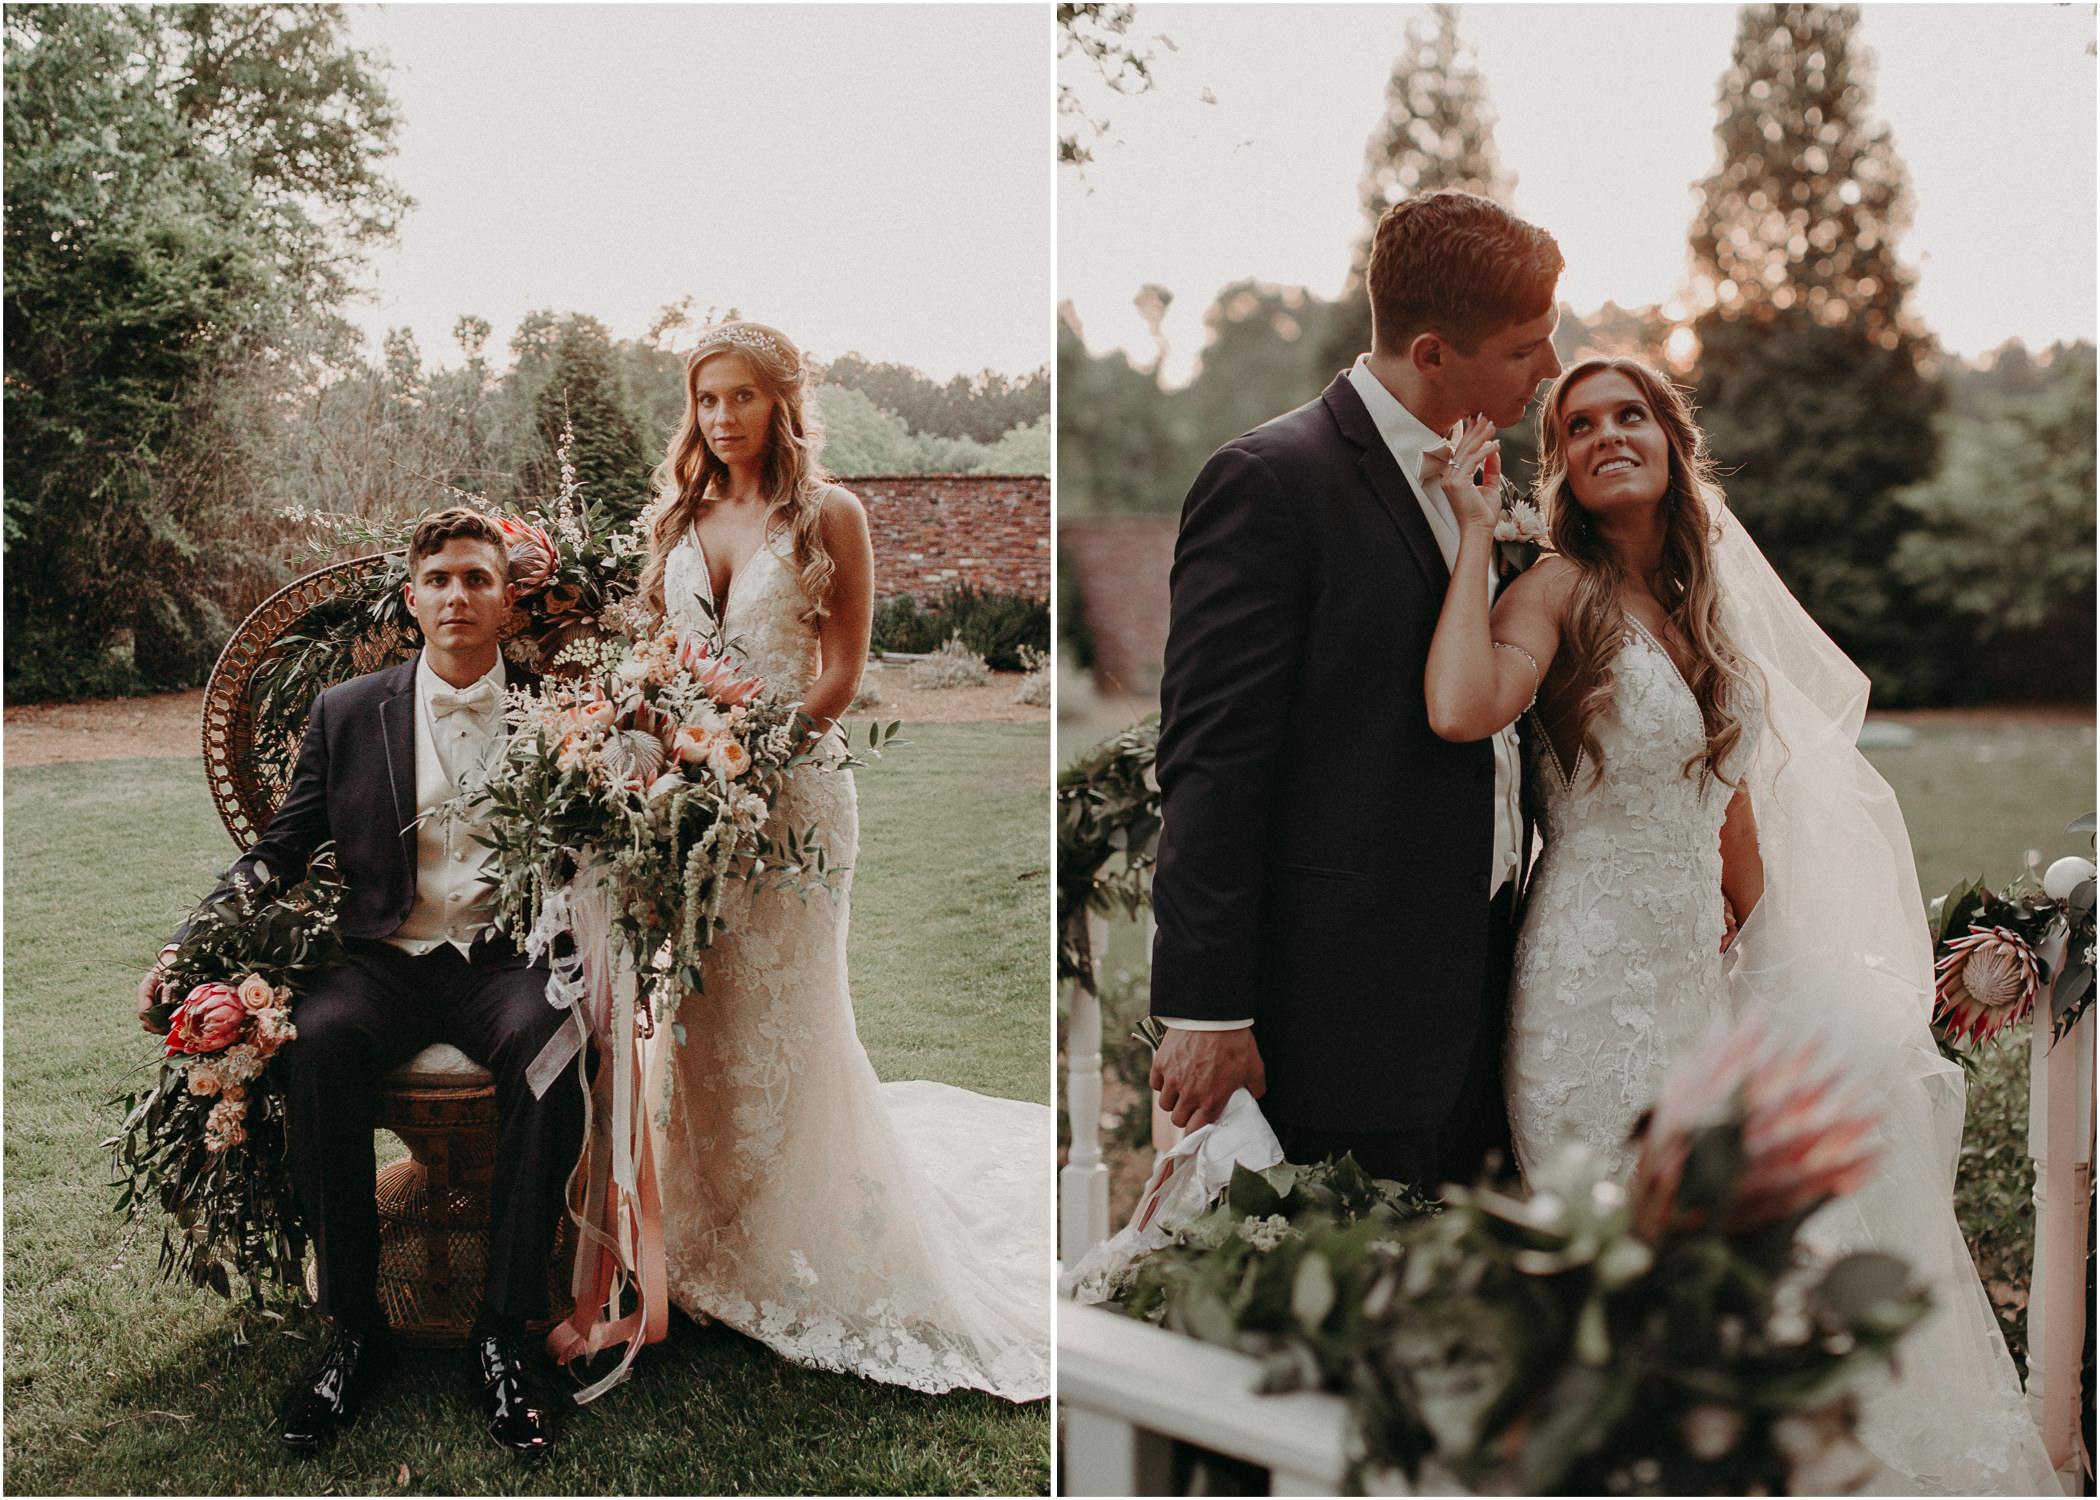 82Carl House Wedding Venue Ga, Atlanta Wedding Photographer - Boho, Bohemian, Junebug Weddings, Vintage, Retro, Trendy. Aline Marin Photography. .jpg